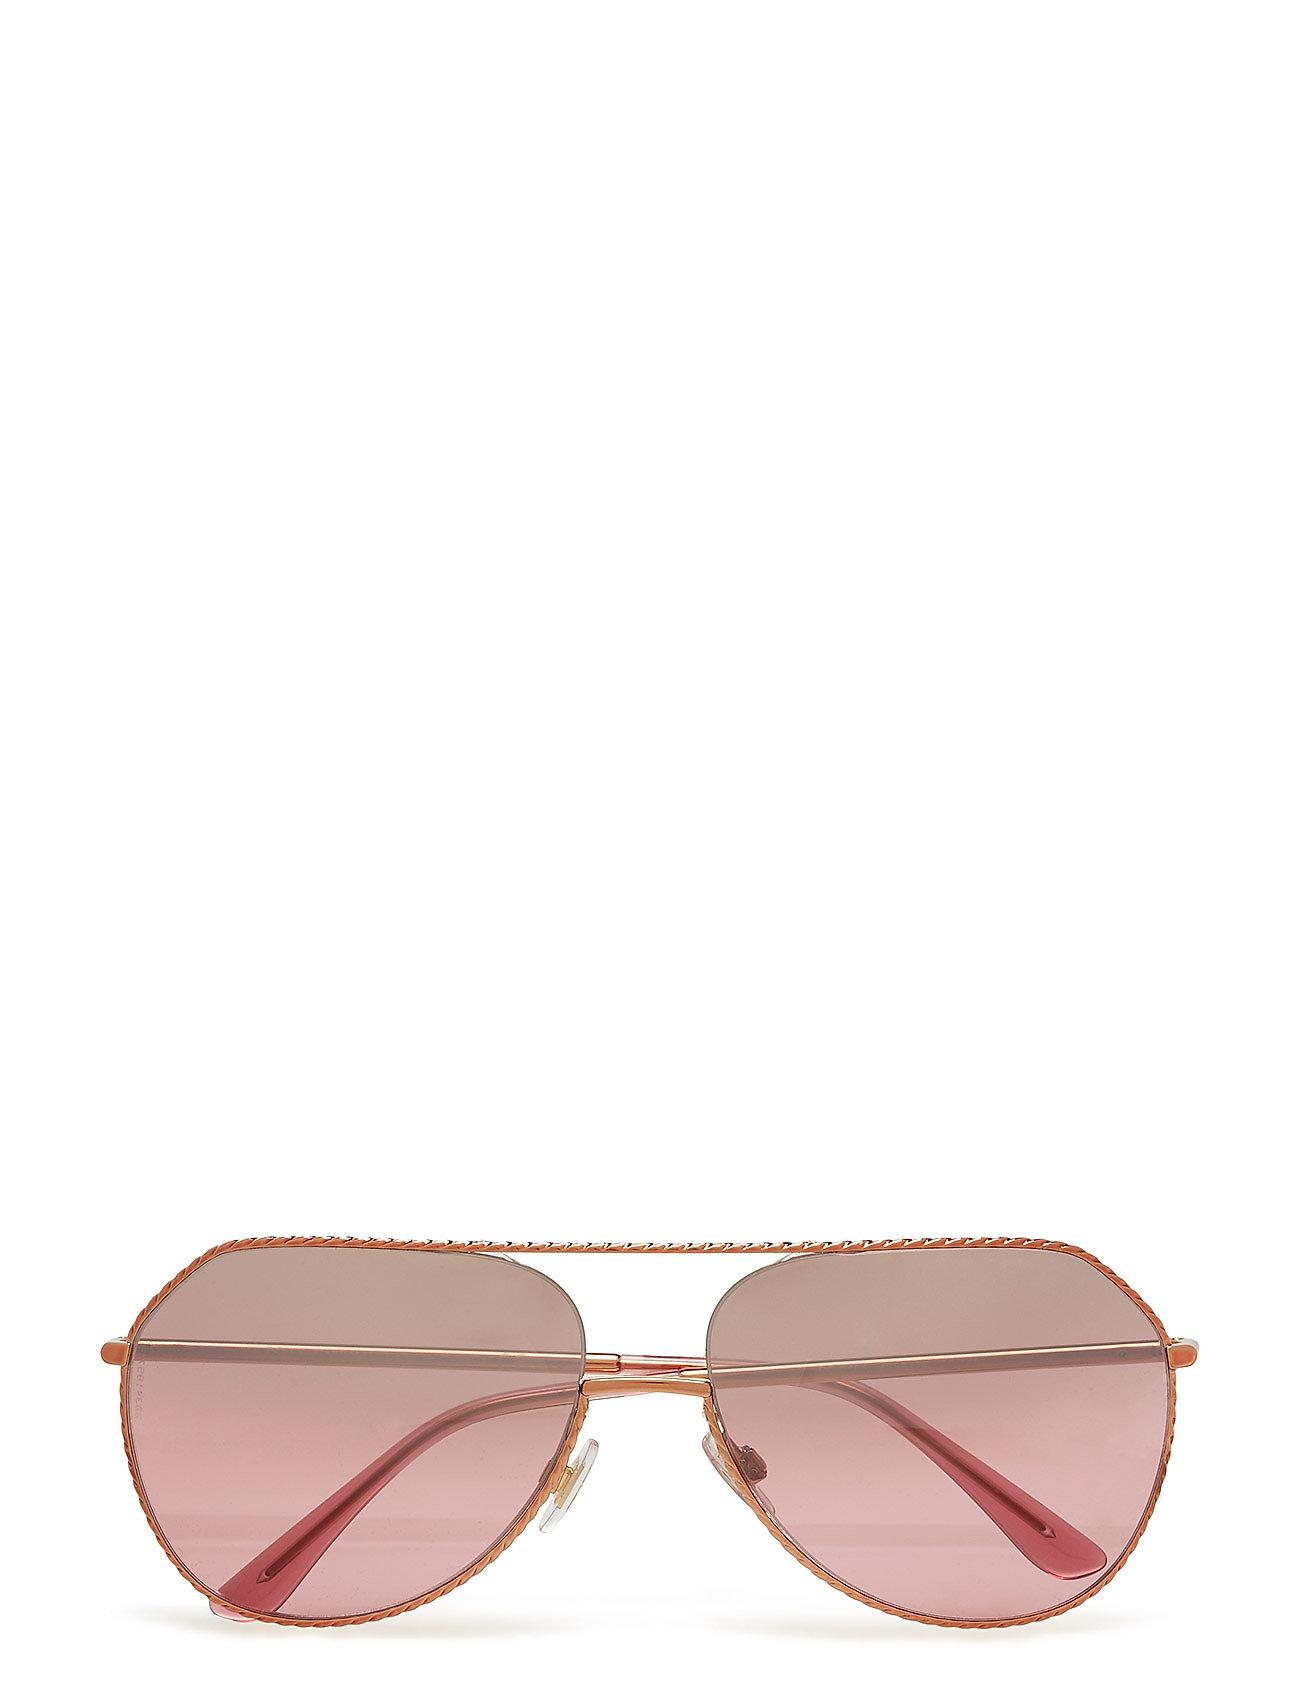 DOLCE & GABBANA Women'S Sunglasses Pilotensonnenbrille Sonnenbrille Pink DOLCE & GABBANA SUNGLASSES